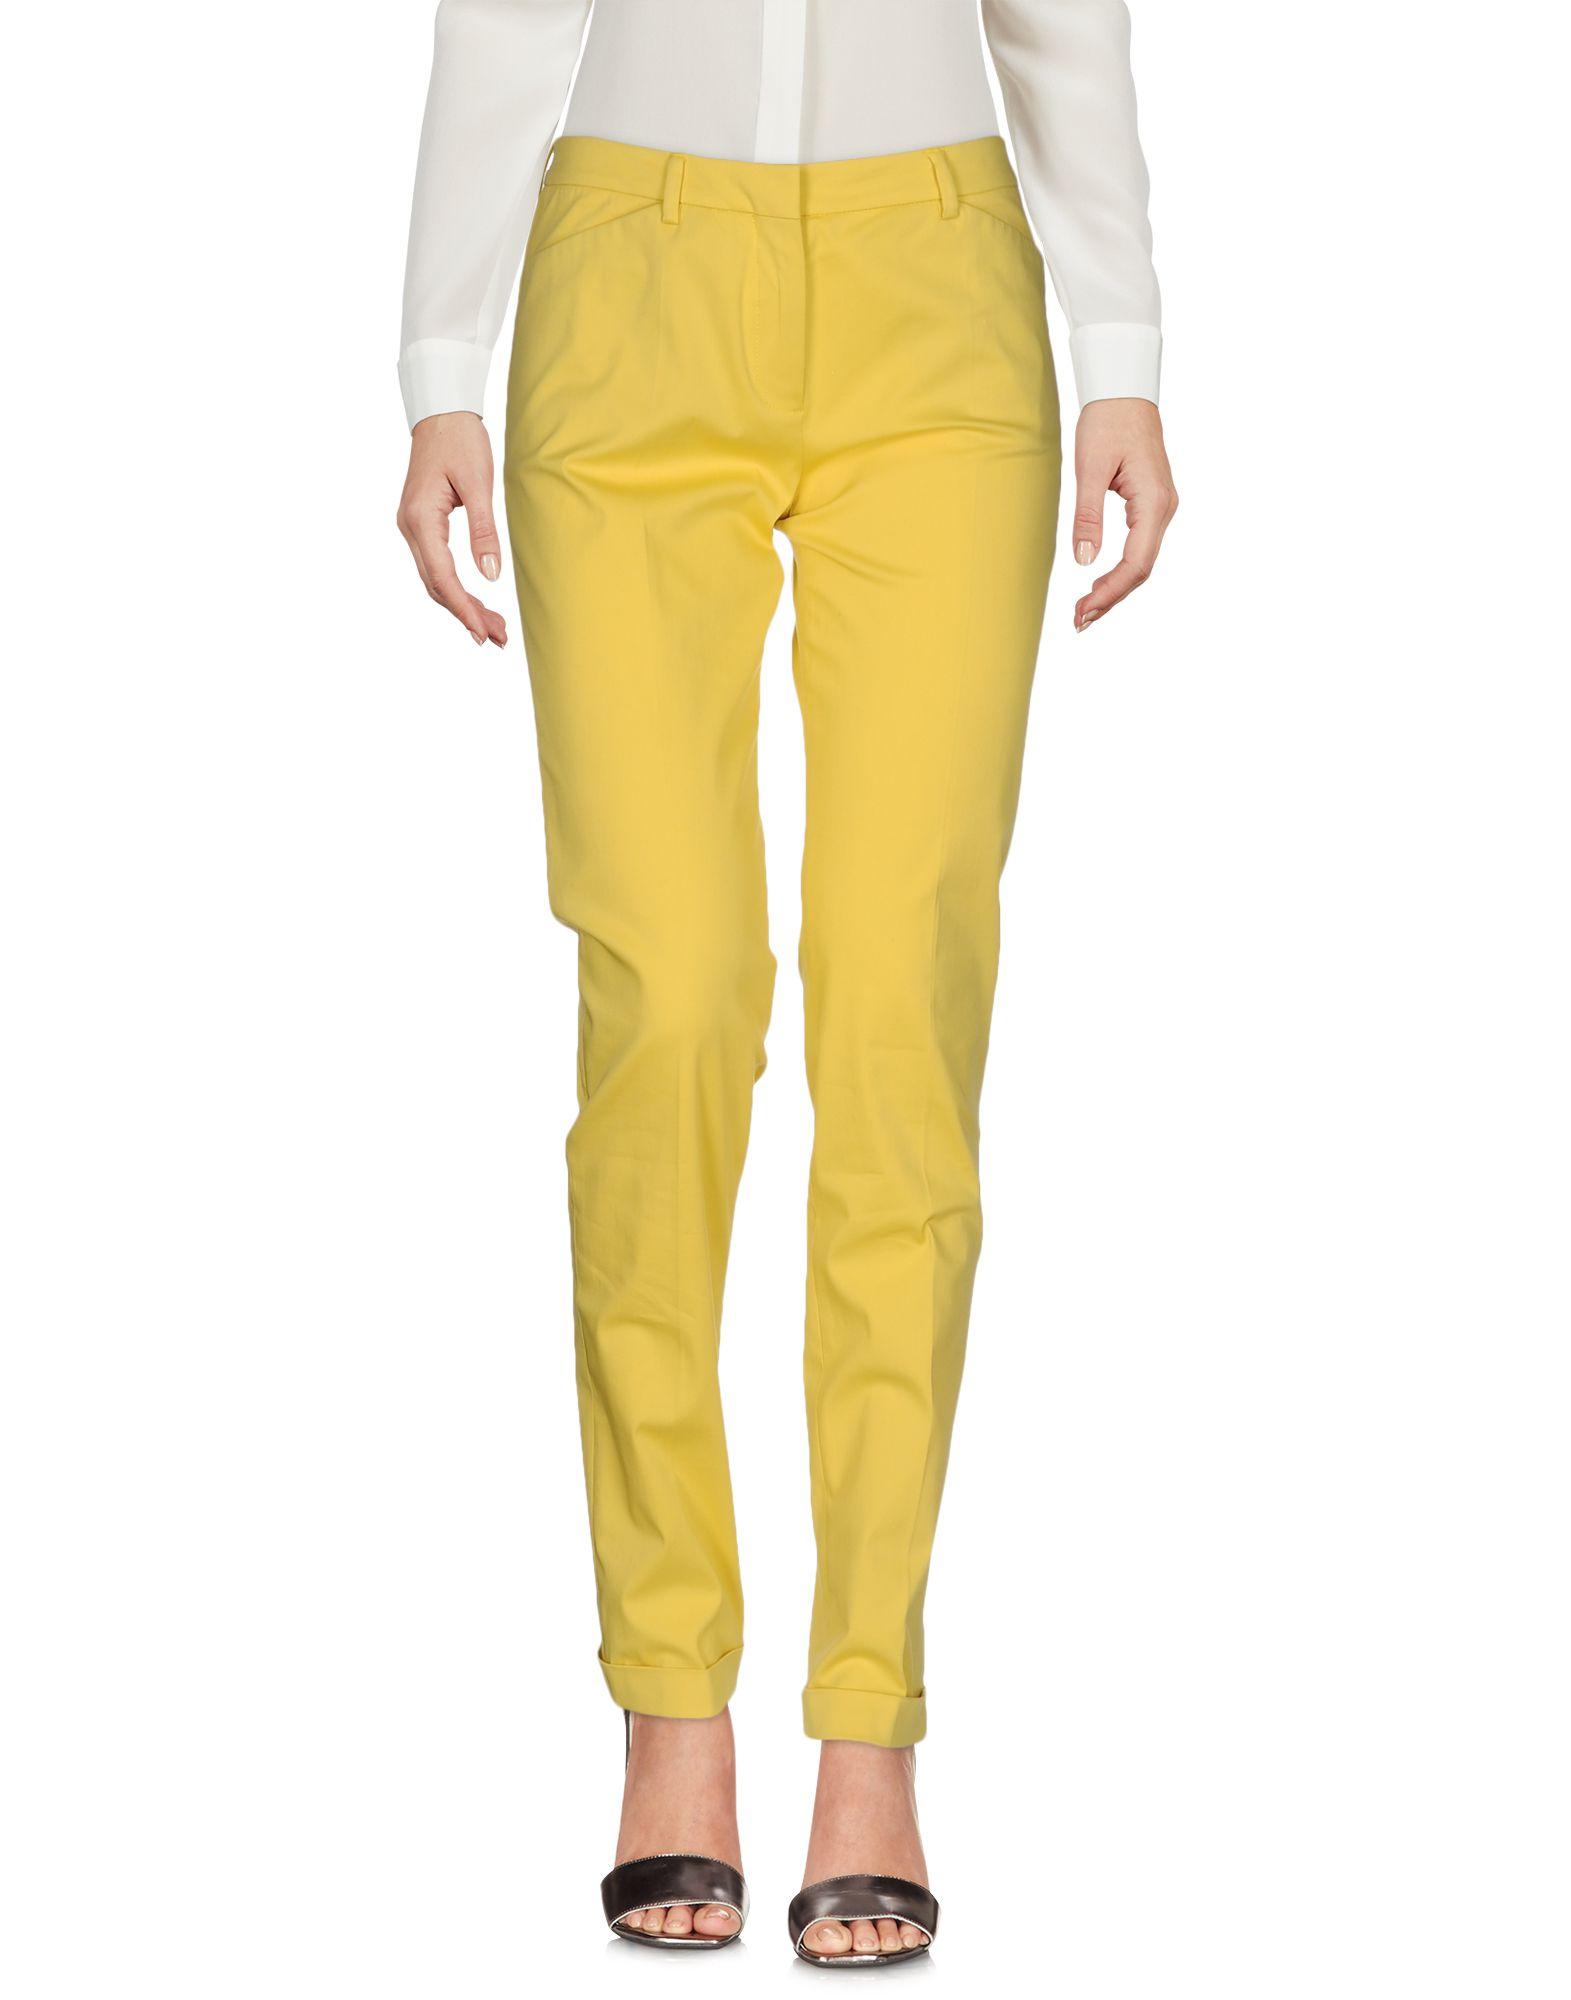 Pantalone Incotex Donna - Acquista online su AxoCTOCSv